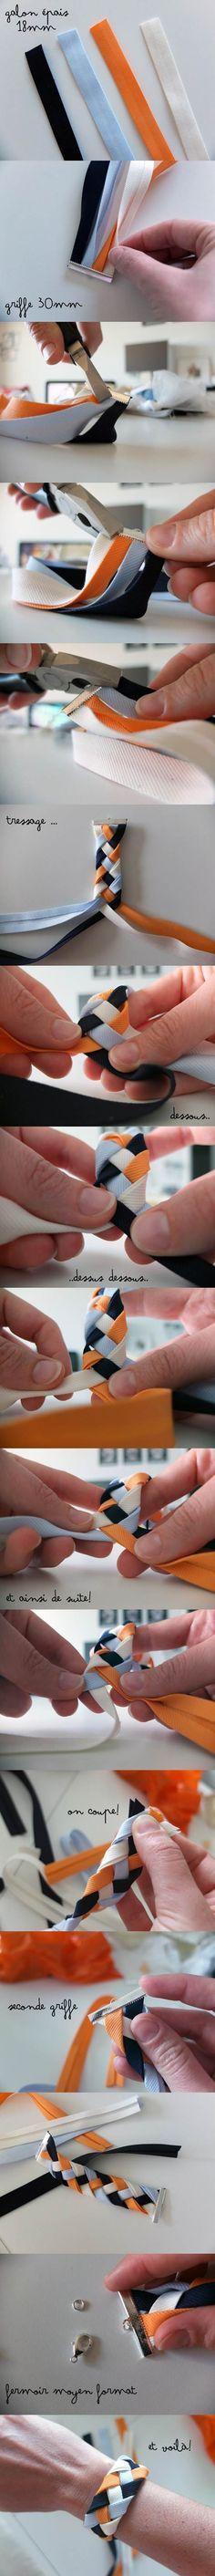 How to DIY 4 Strand Braided Ribbon Bracelet | iCreativeIdeas.com Follow Us on Facebook --> https://www.facebook.com/icreativeideas